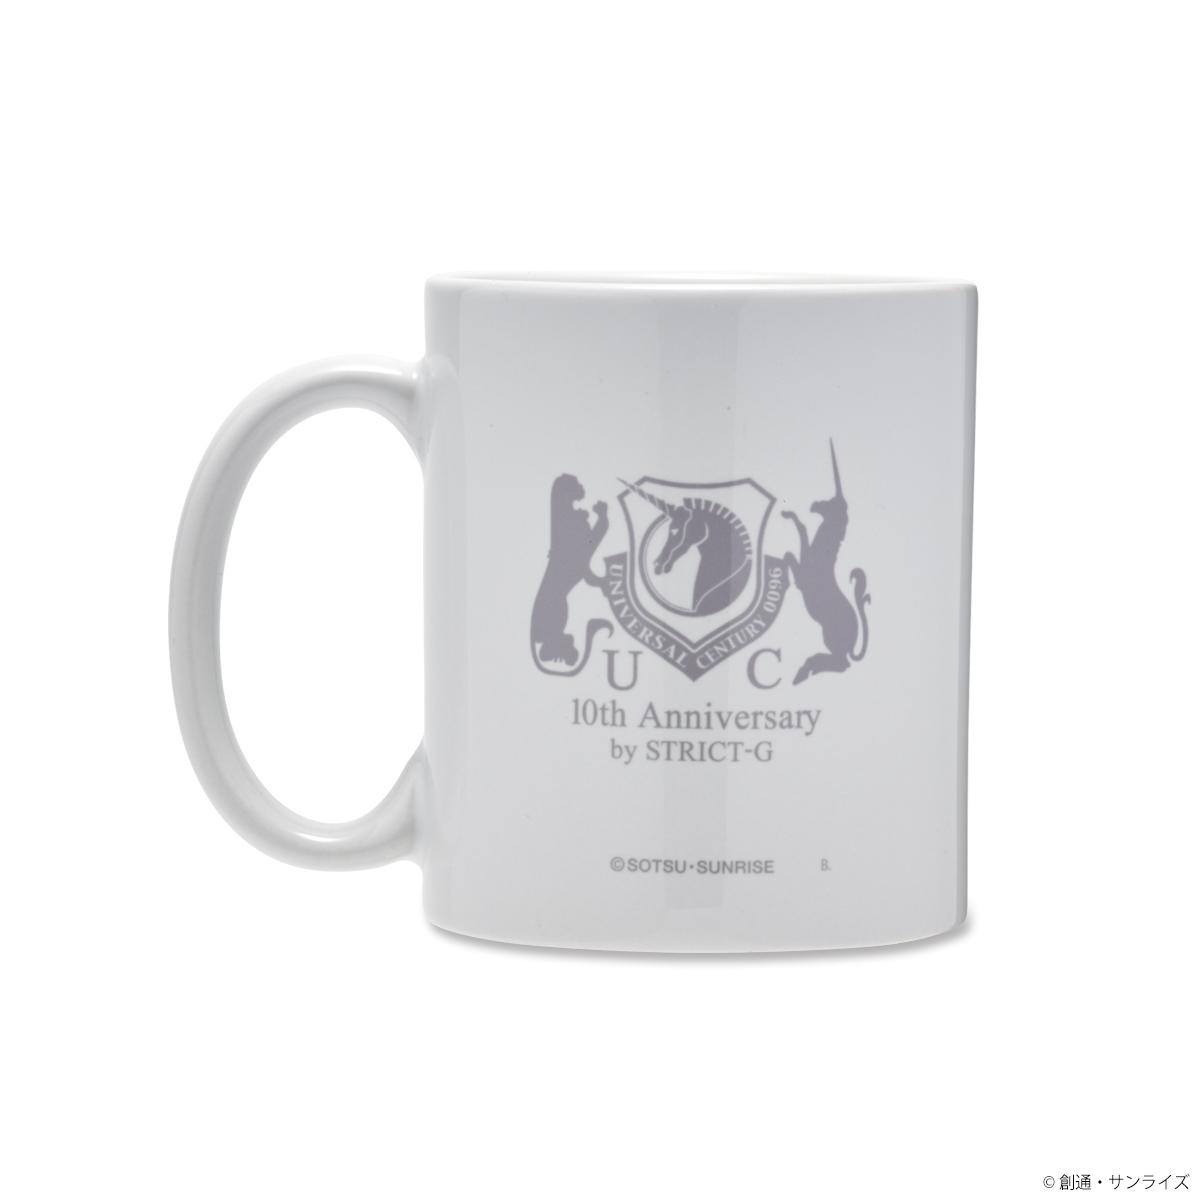 STRICT-G『機動戦士ガンダムUC』 OVA10周年記念 マグカップ タペストリー柄